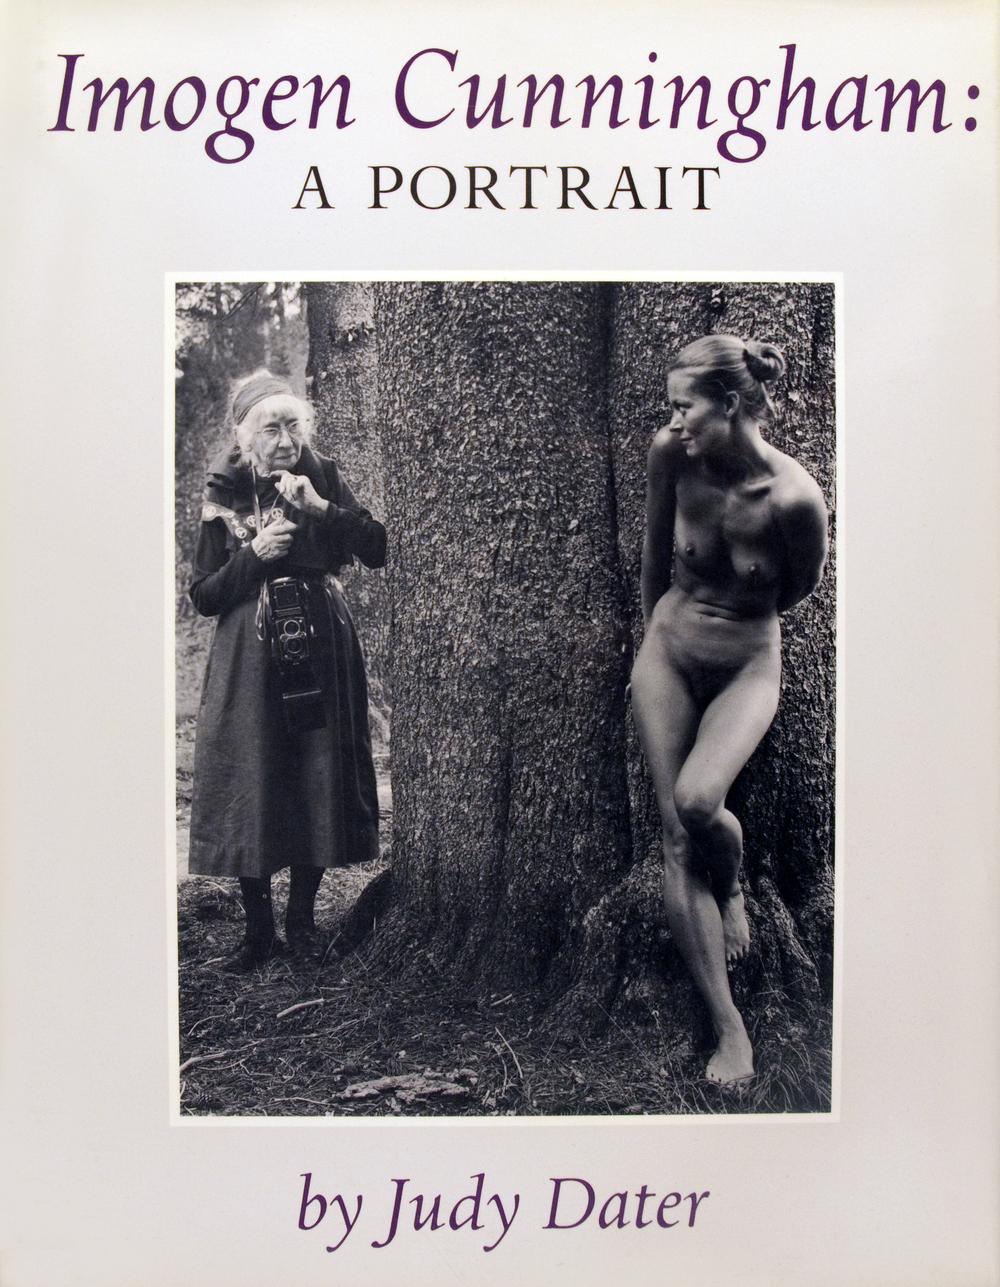 Imogen Cunningham: A Portrait, 1979